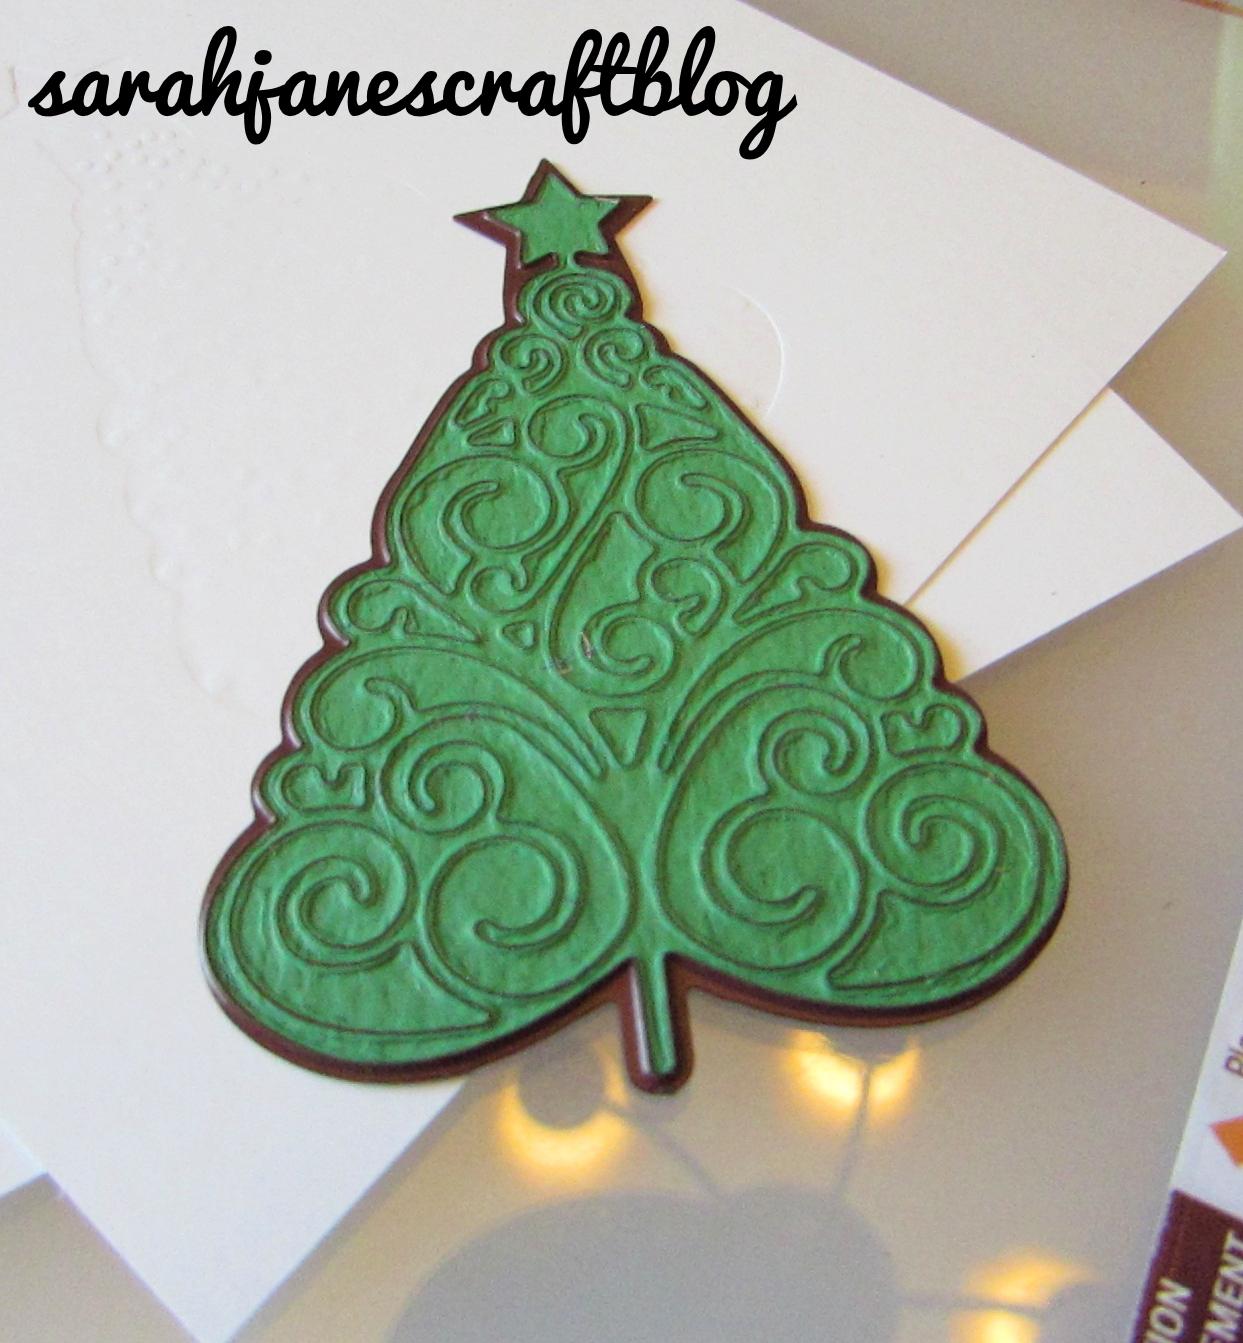 Sarah jane 39 s craft blog cuttlebug die cutting part 2 for Www cuttlebug crafts com